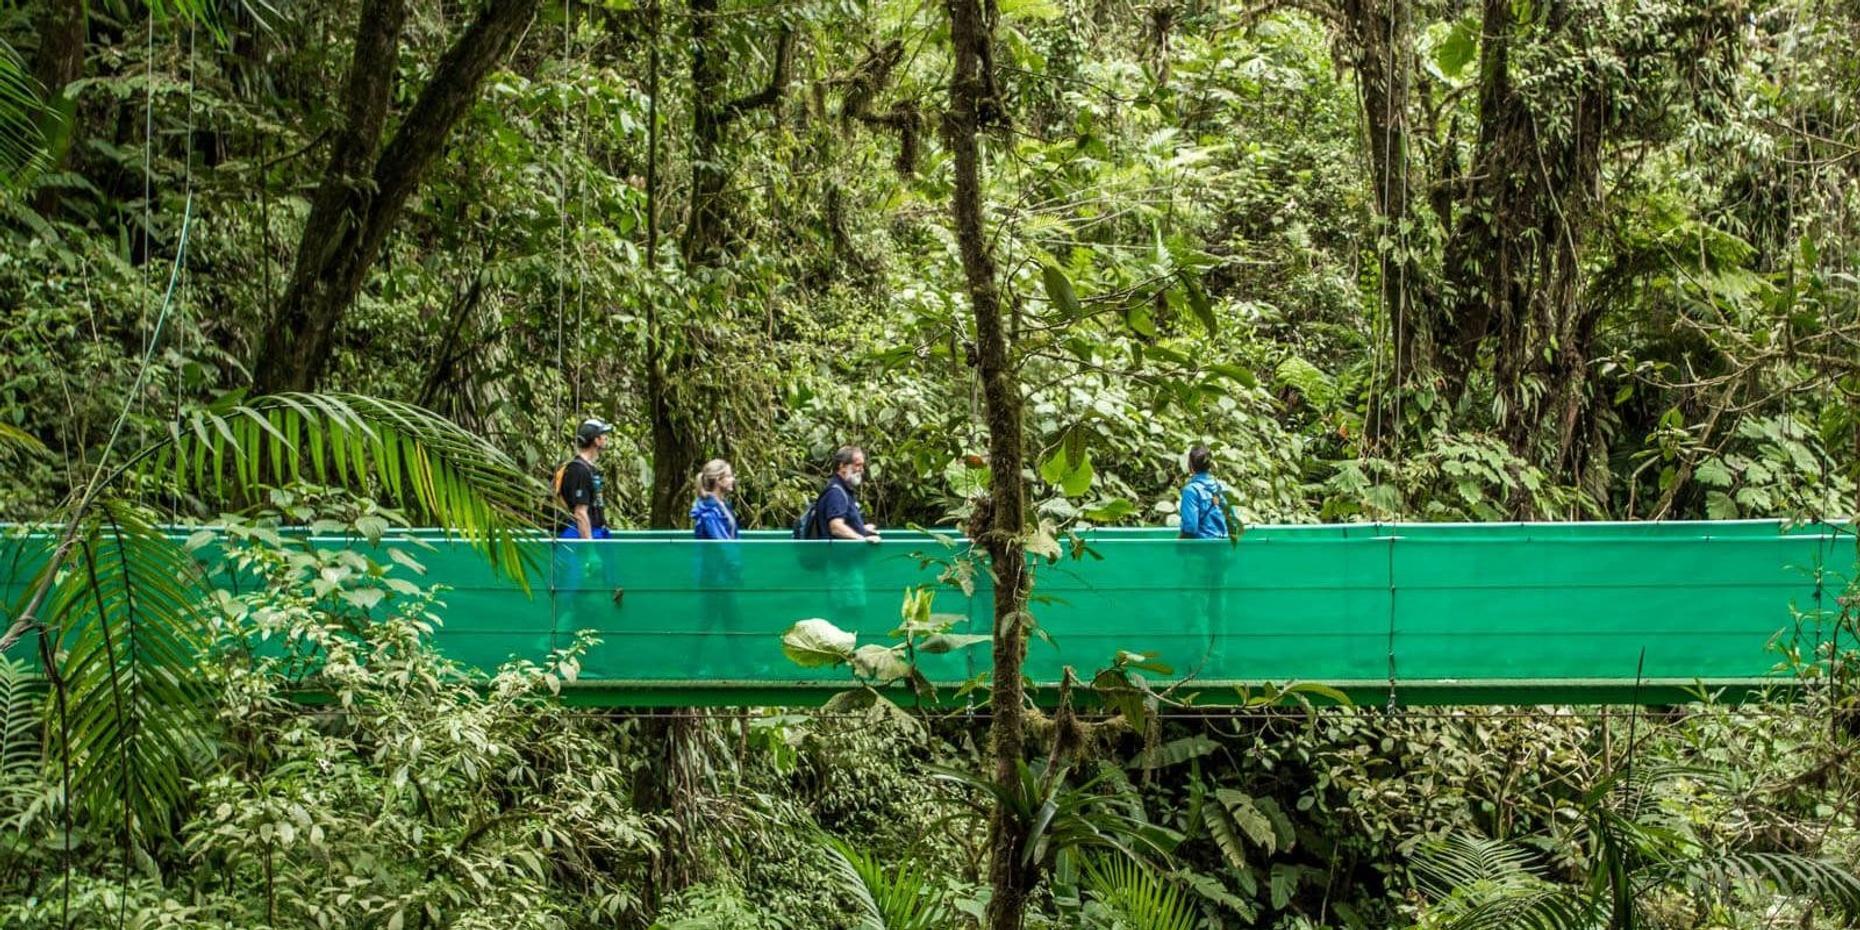 Guided Nature Walk and Suspension Bridge Tour in Monteverde